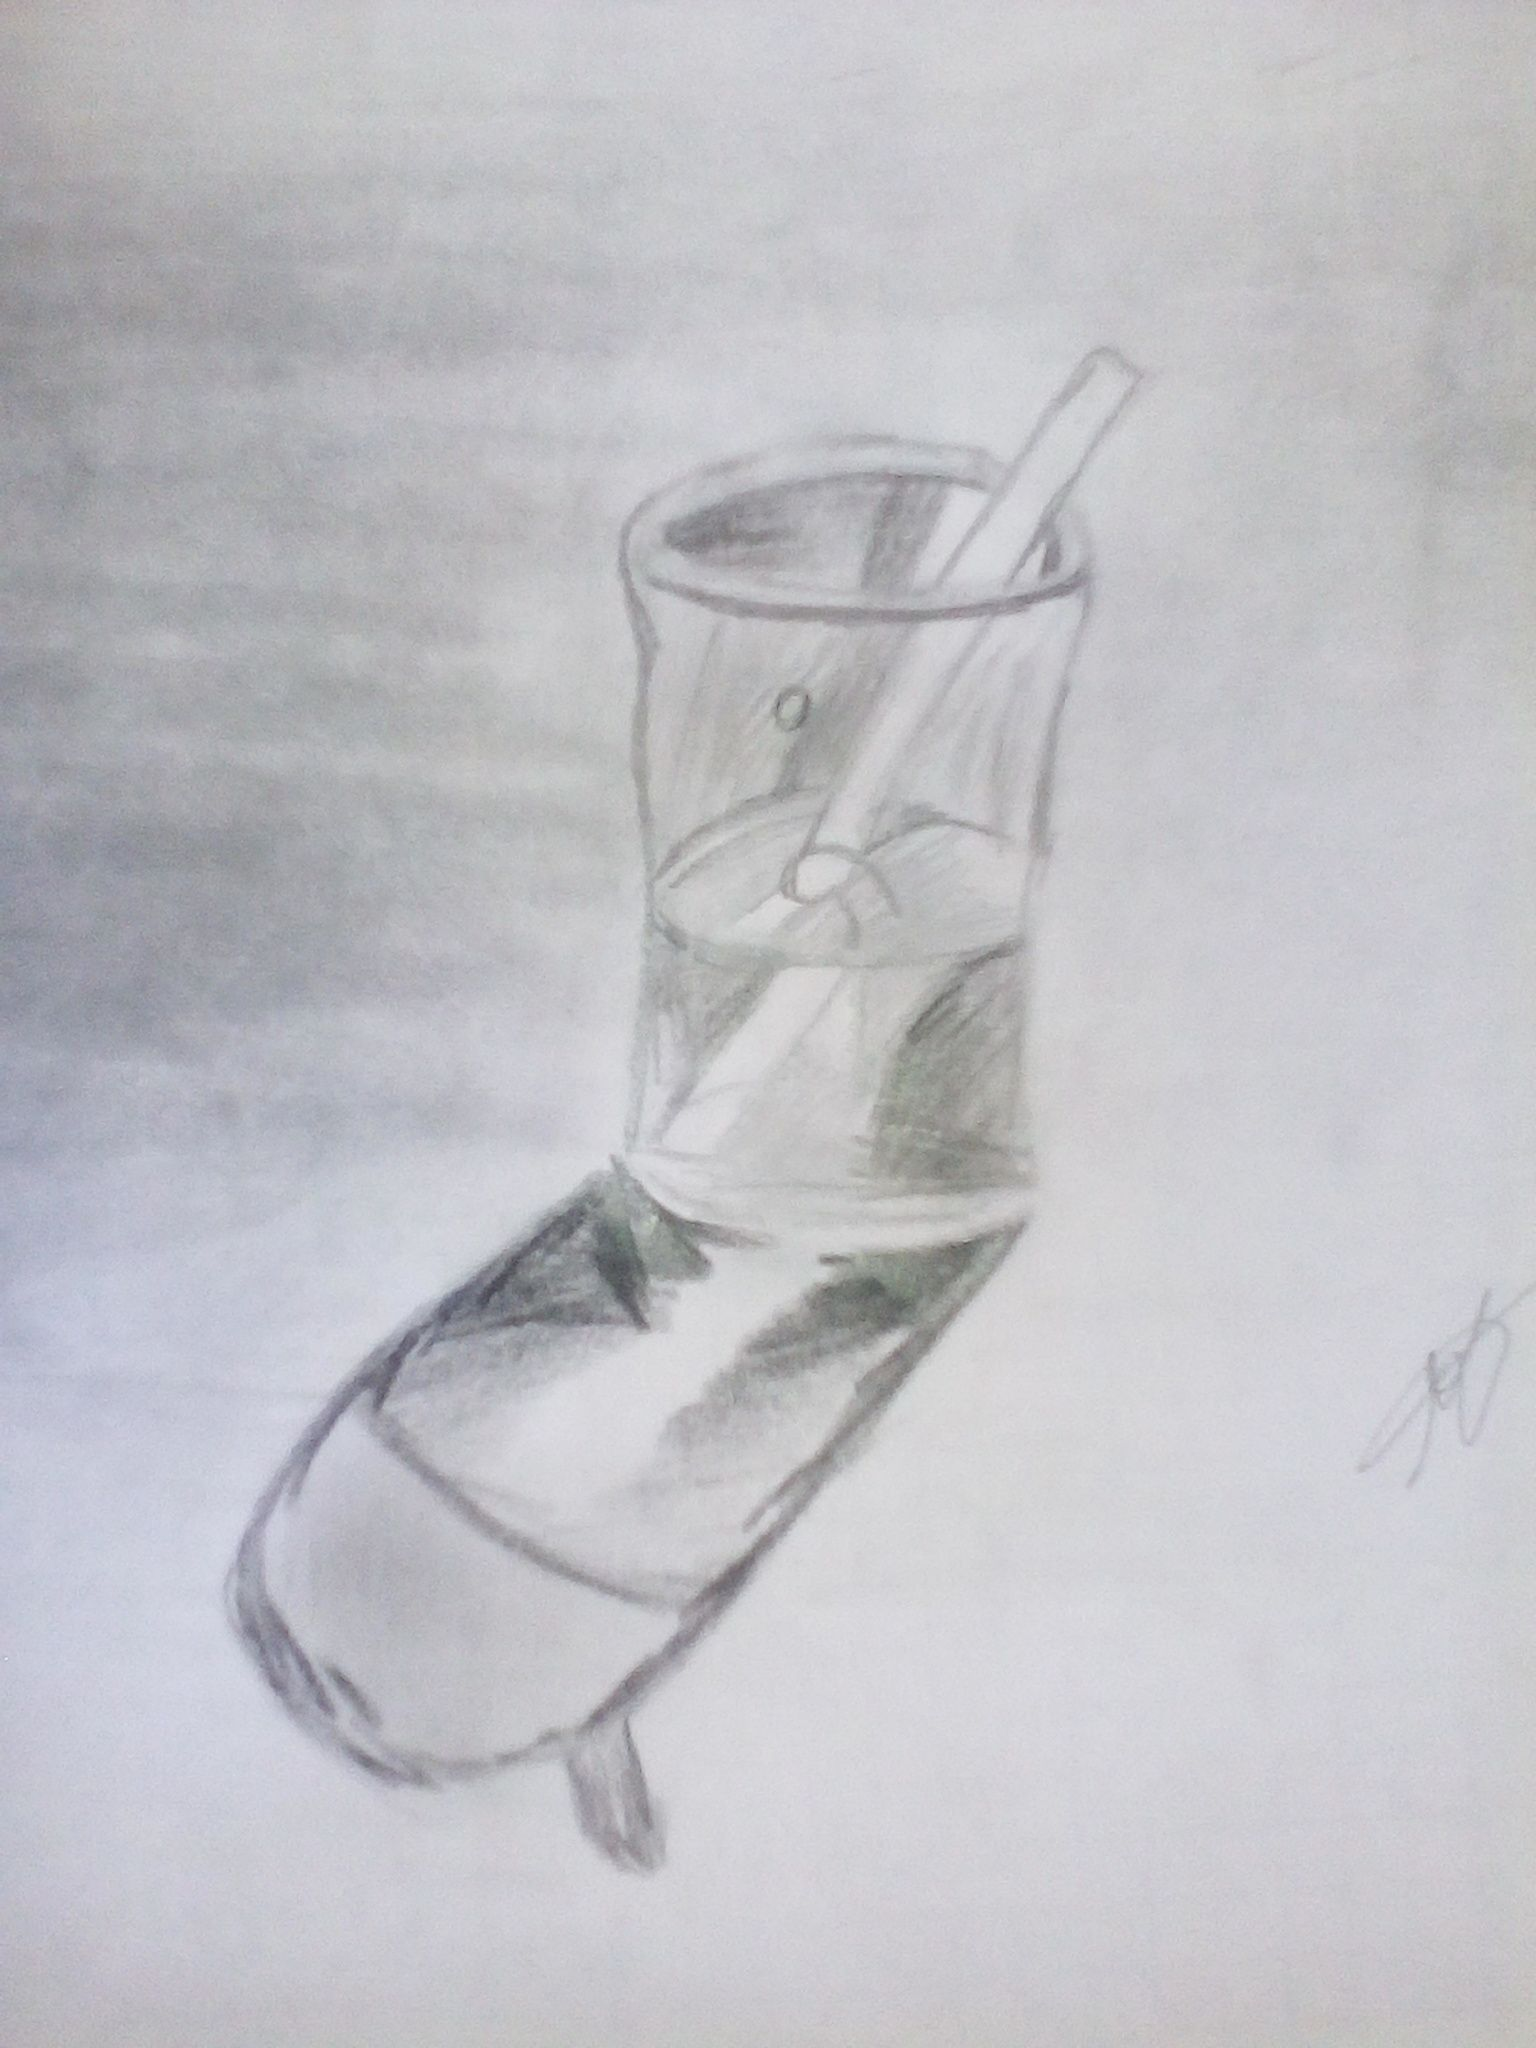 Dibujo De Un Vaso De Agua A Lapiz En 2020 Dibujos 3d Dibujos A Lapiz Dibujos